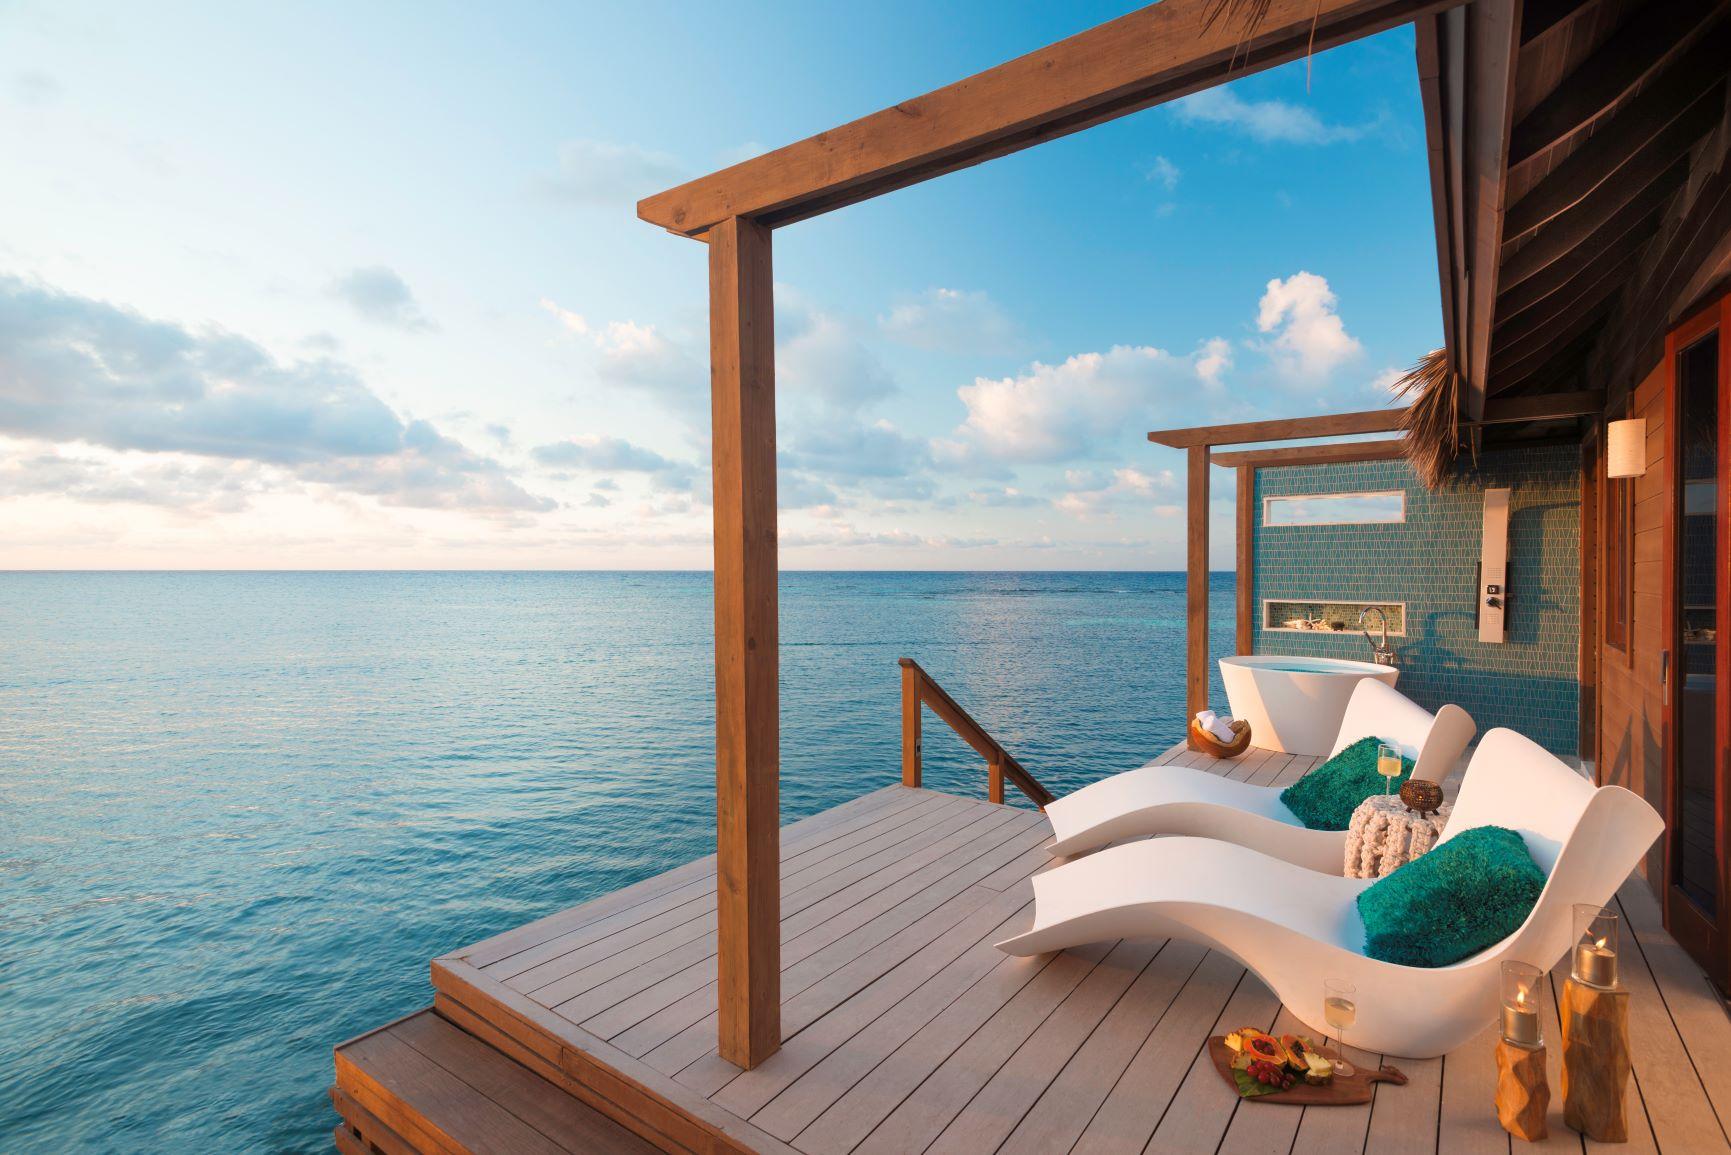 Caribbean Luxury HolidaysSandals Jamaica Flagstone Travel Royal JK3Tl1uFc